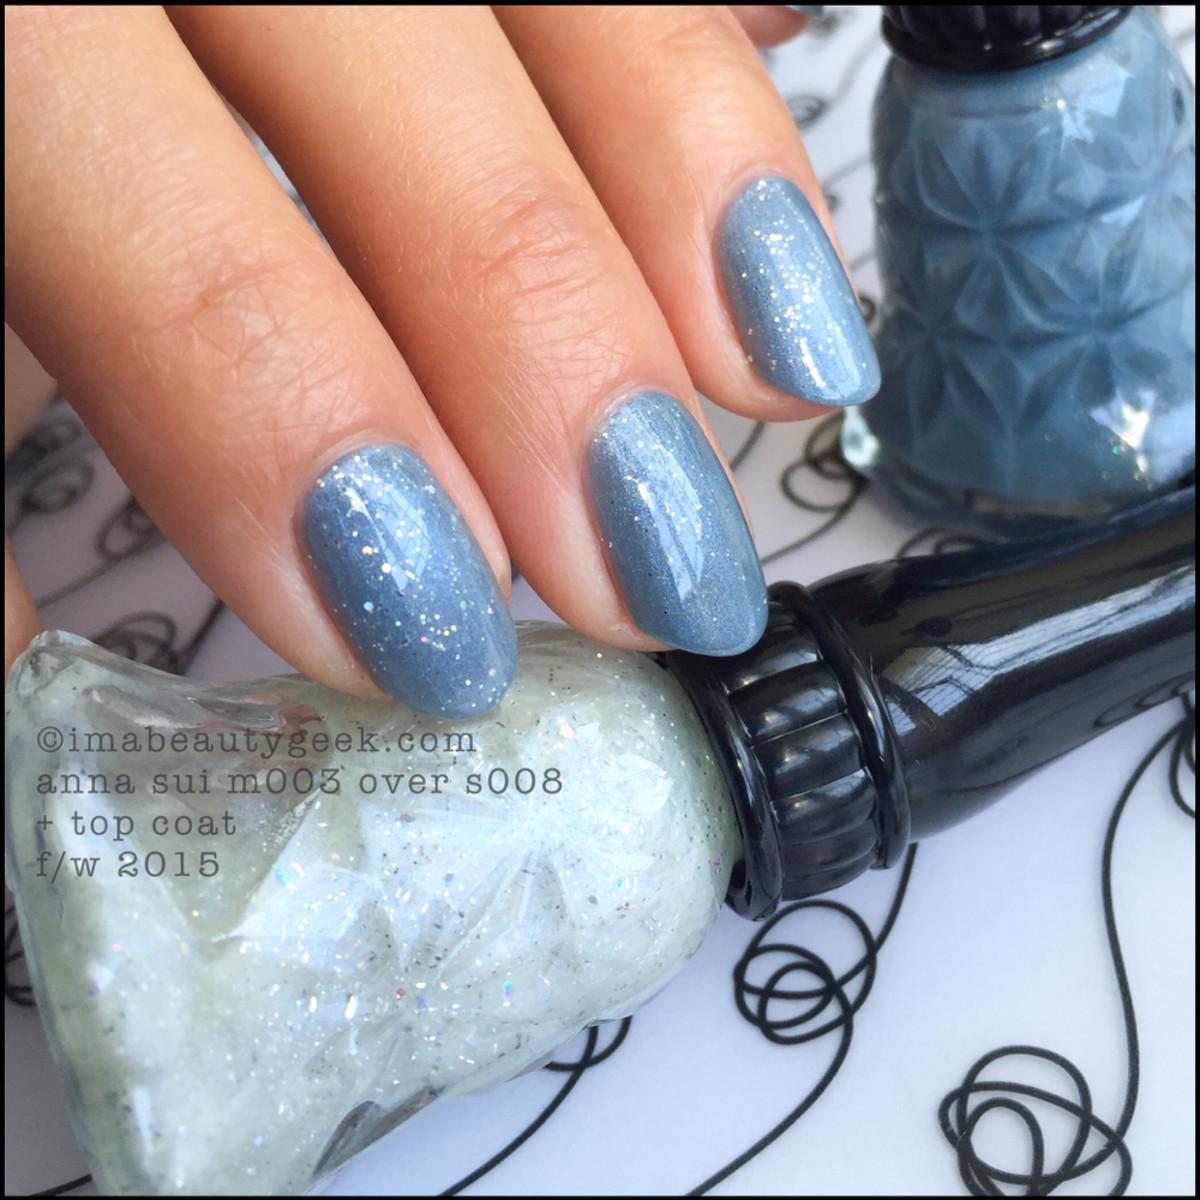 Anna Sui Nail Polish M003 over S008_Anna Sui Nail Color 2015_2